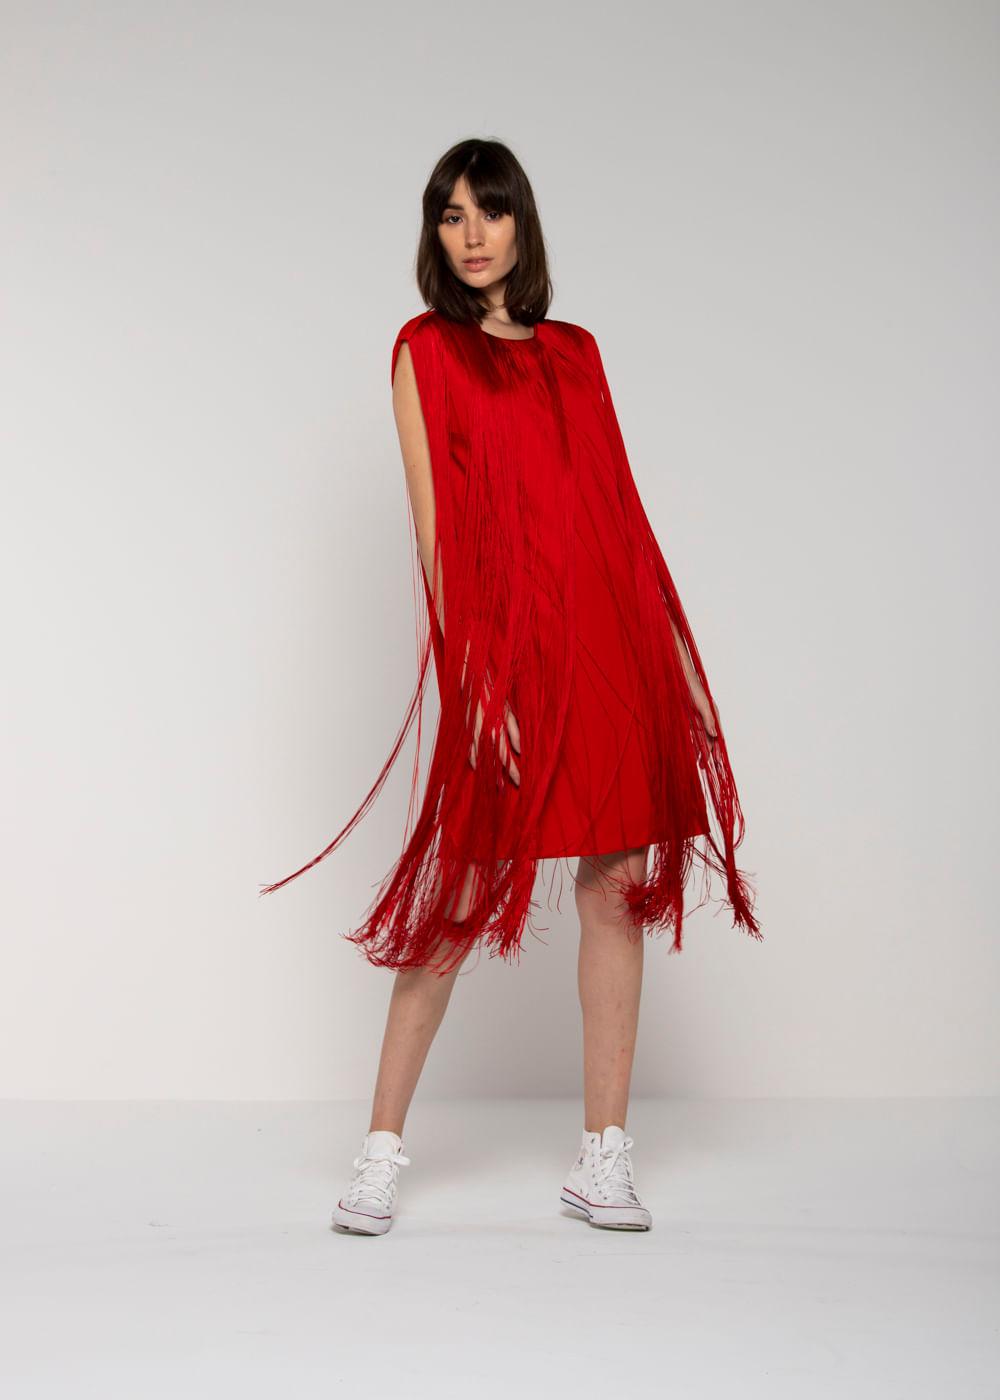 Vestido De Viscose Franja Vermelho Vermelha 44 It